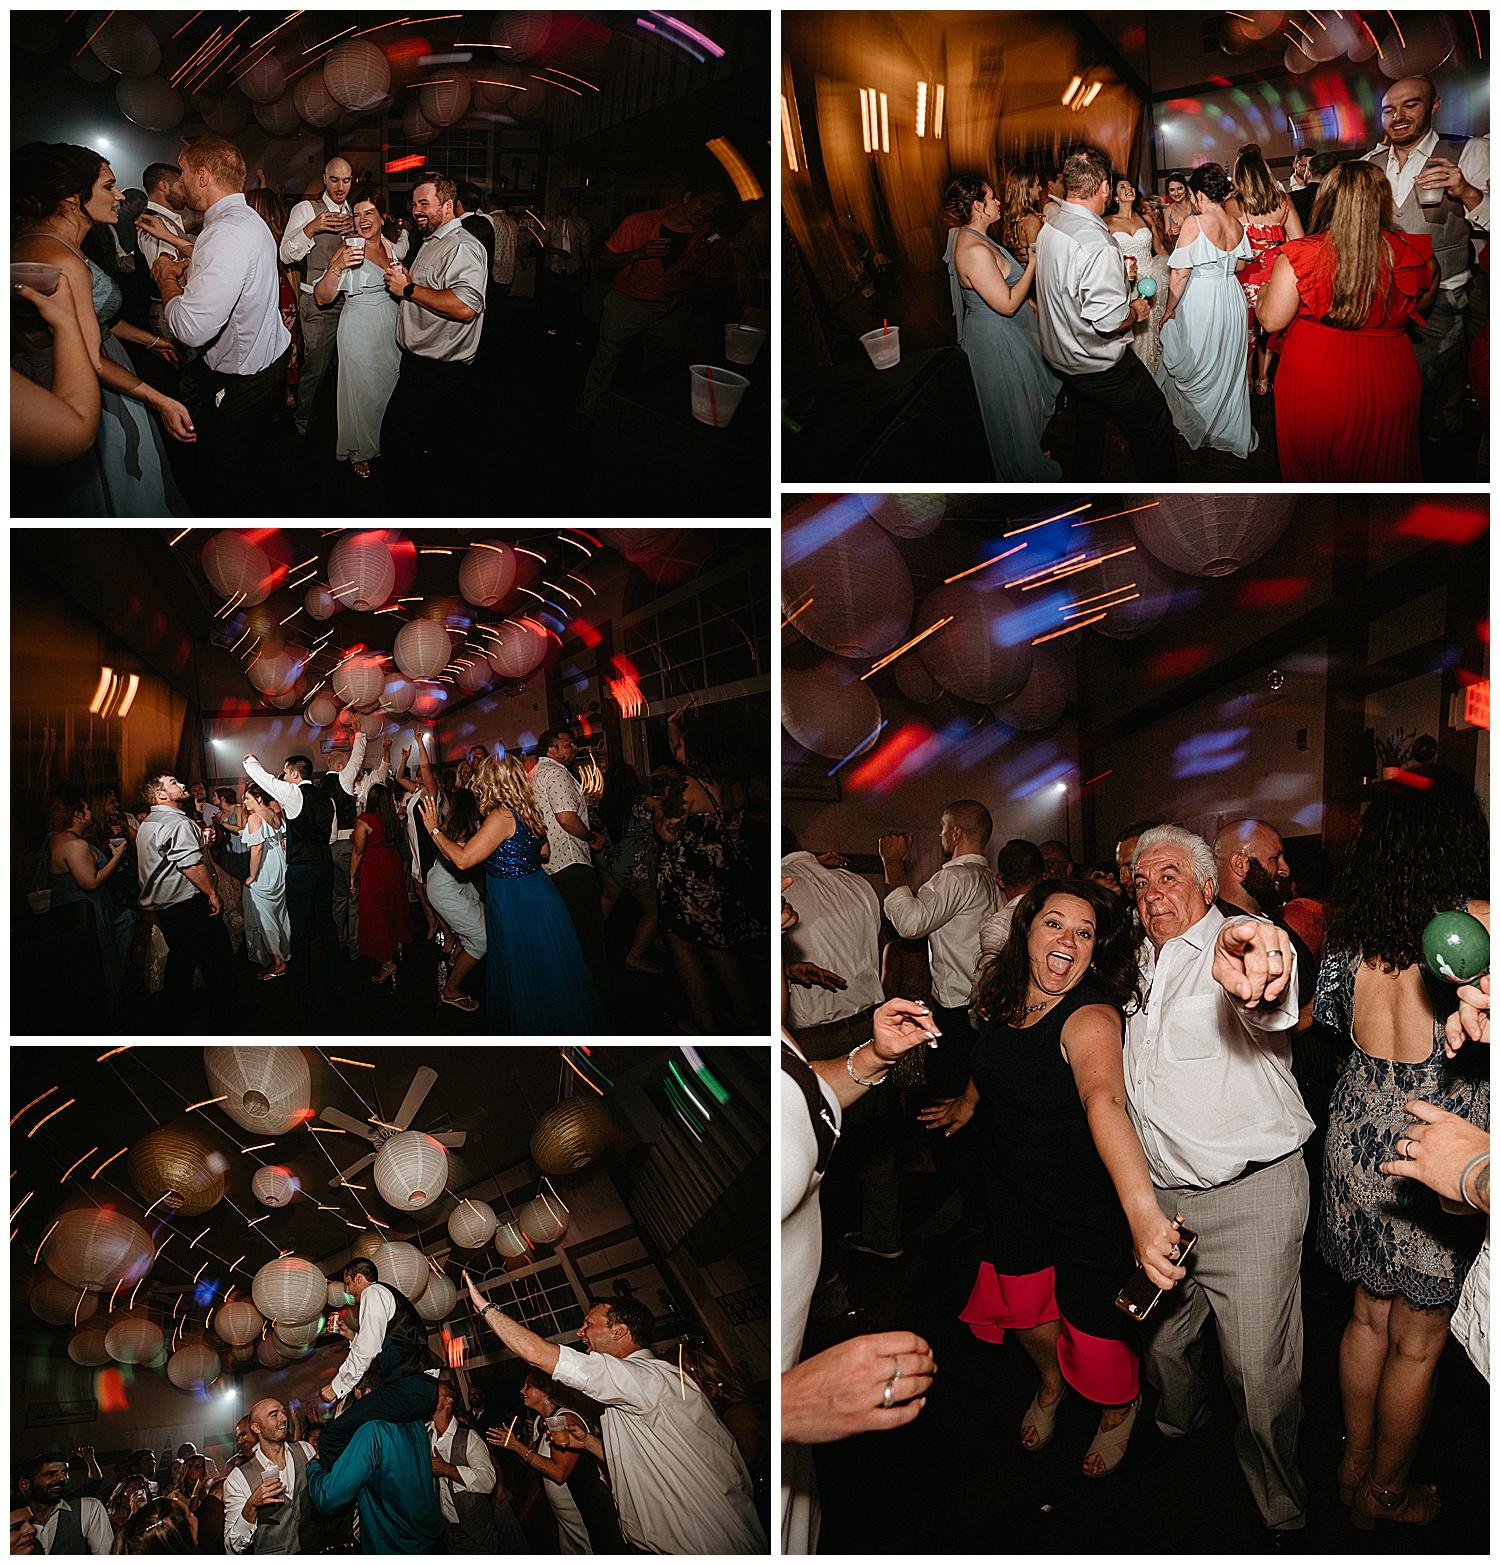 NEPA-Bloomsburg-Wedding-Photographer-at-The-Barn-at-Boones-Dam-Bloomsburg-PA_0066.jpg